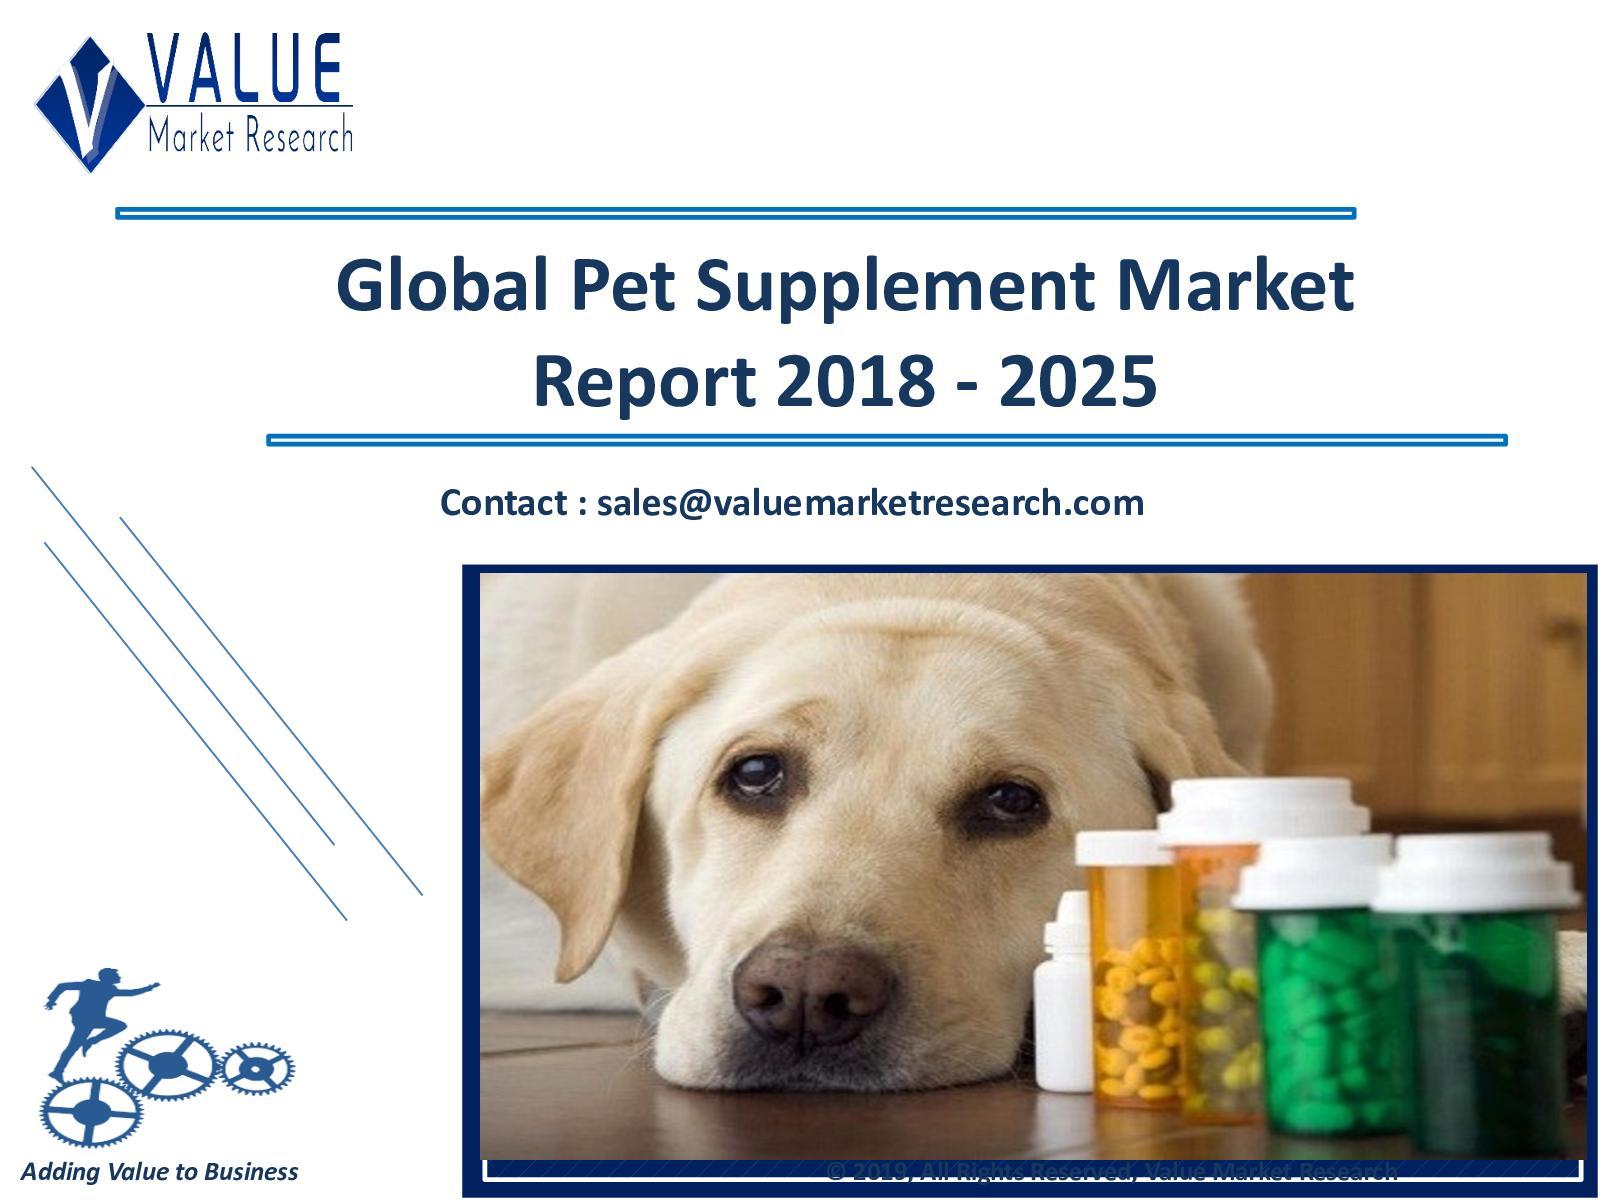 Calaméo - Pet Supplement Market Size, Industry Research Report 2018